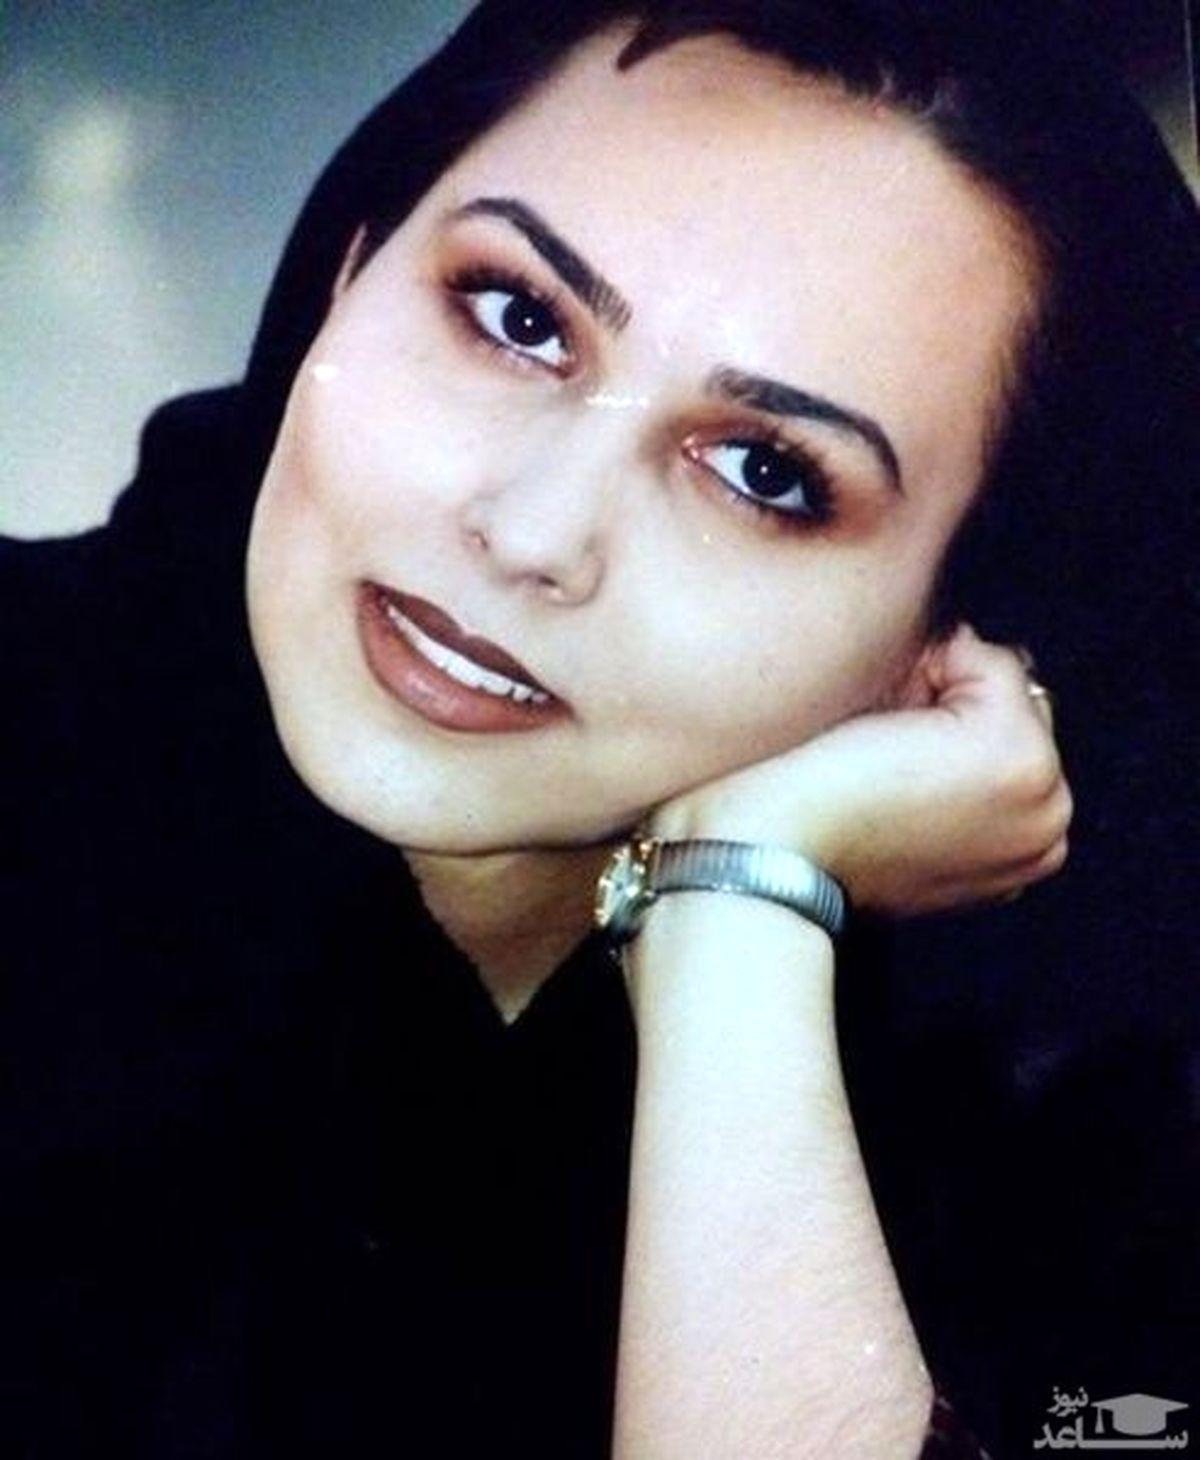 عکس لورفته از پرستو صالحی قبل از عمل زیبایی + عکس